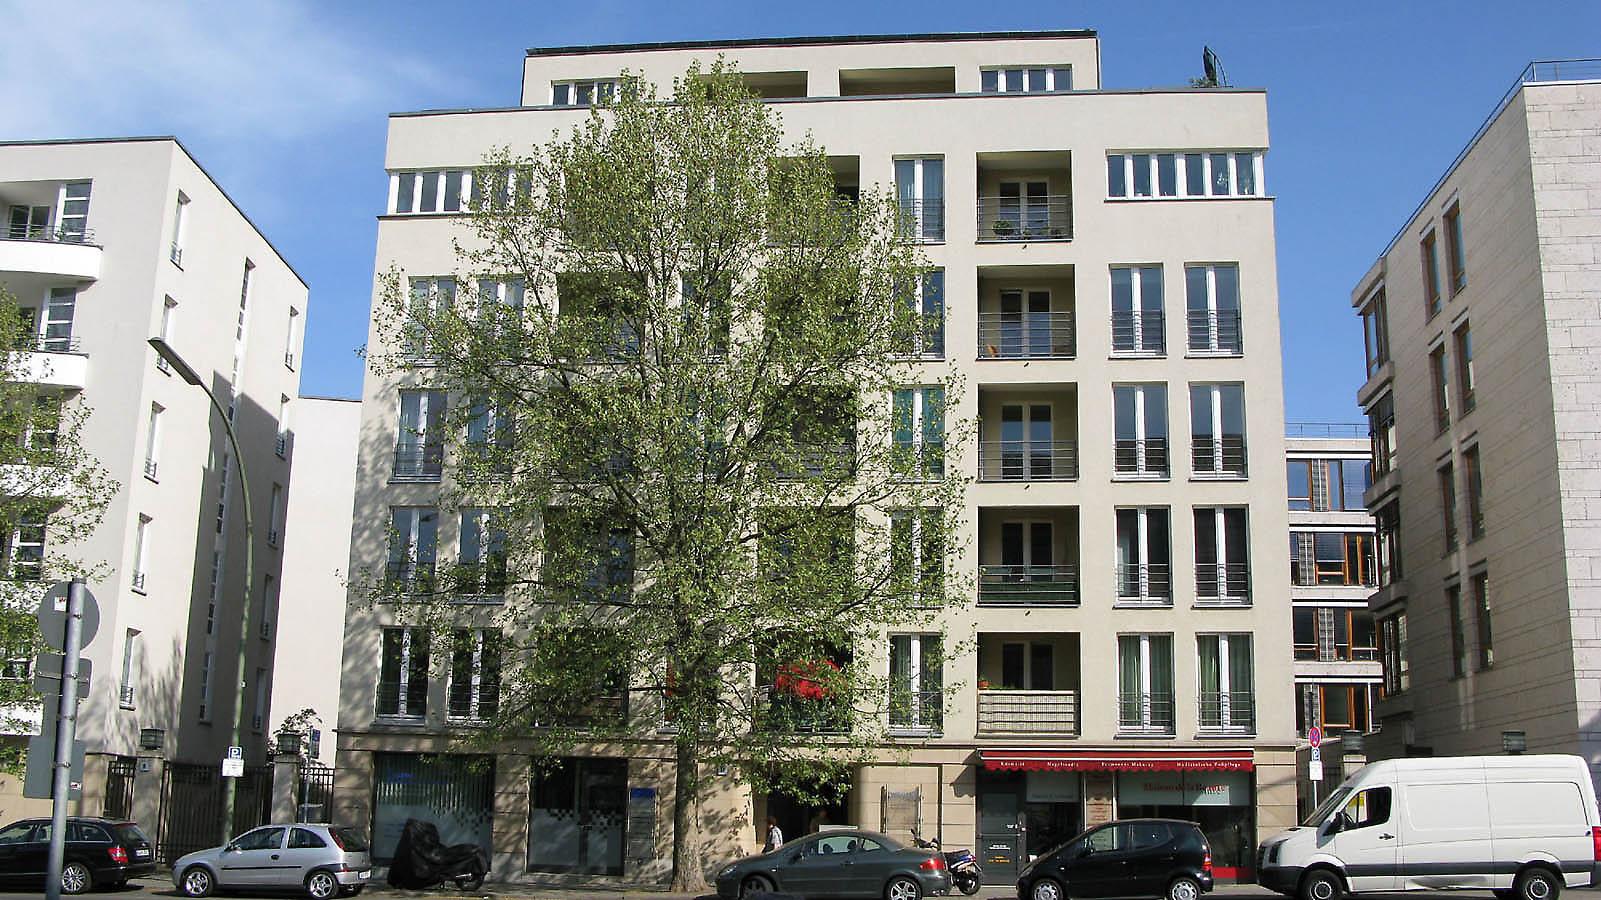 Walter Stepp Berlin Apartments